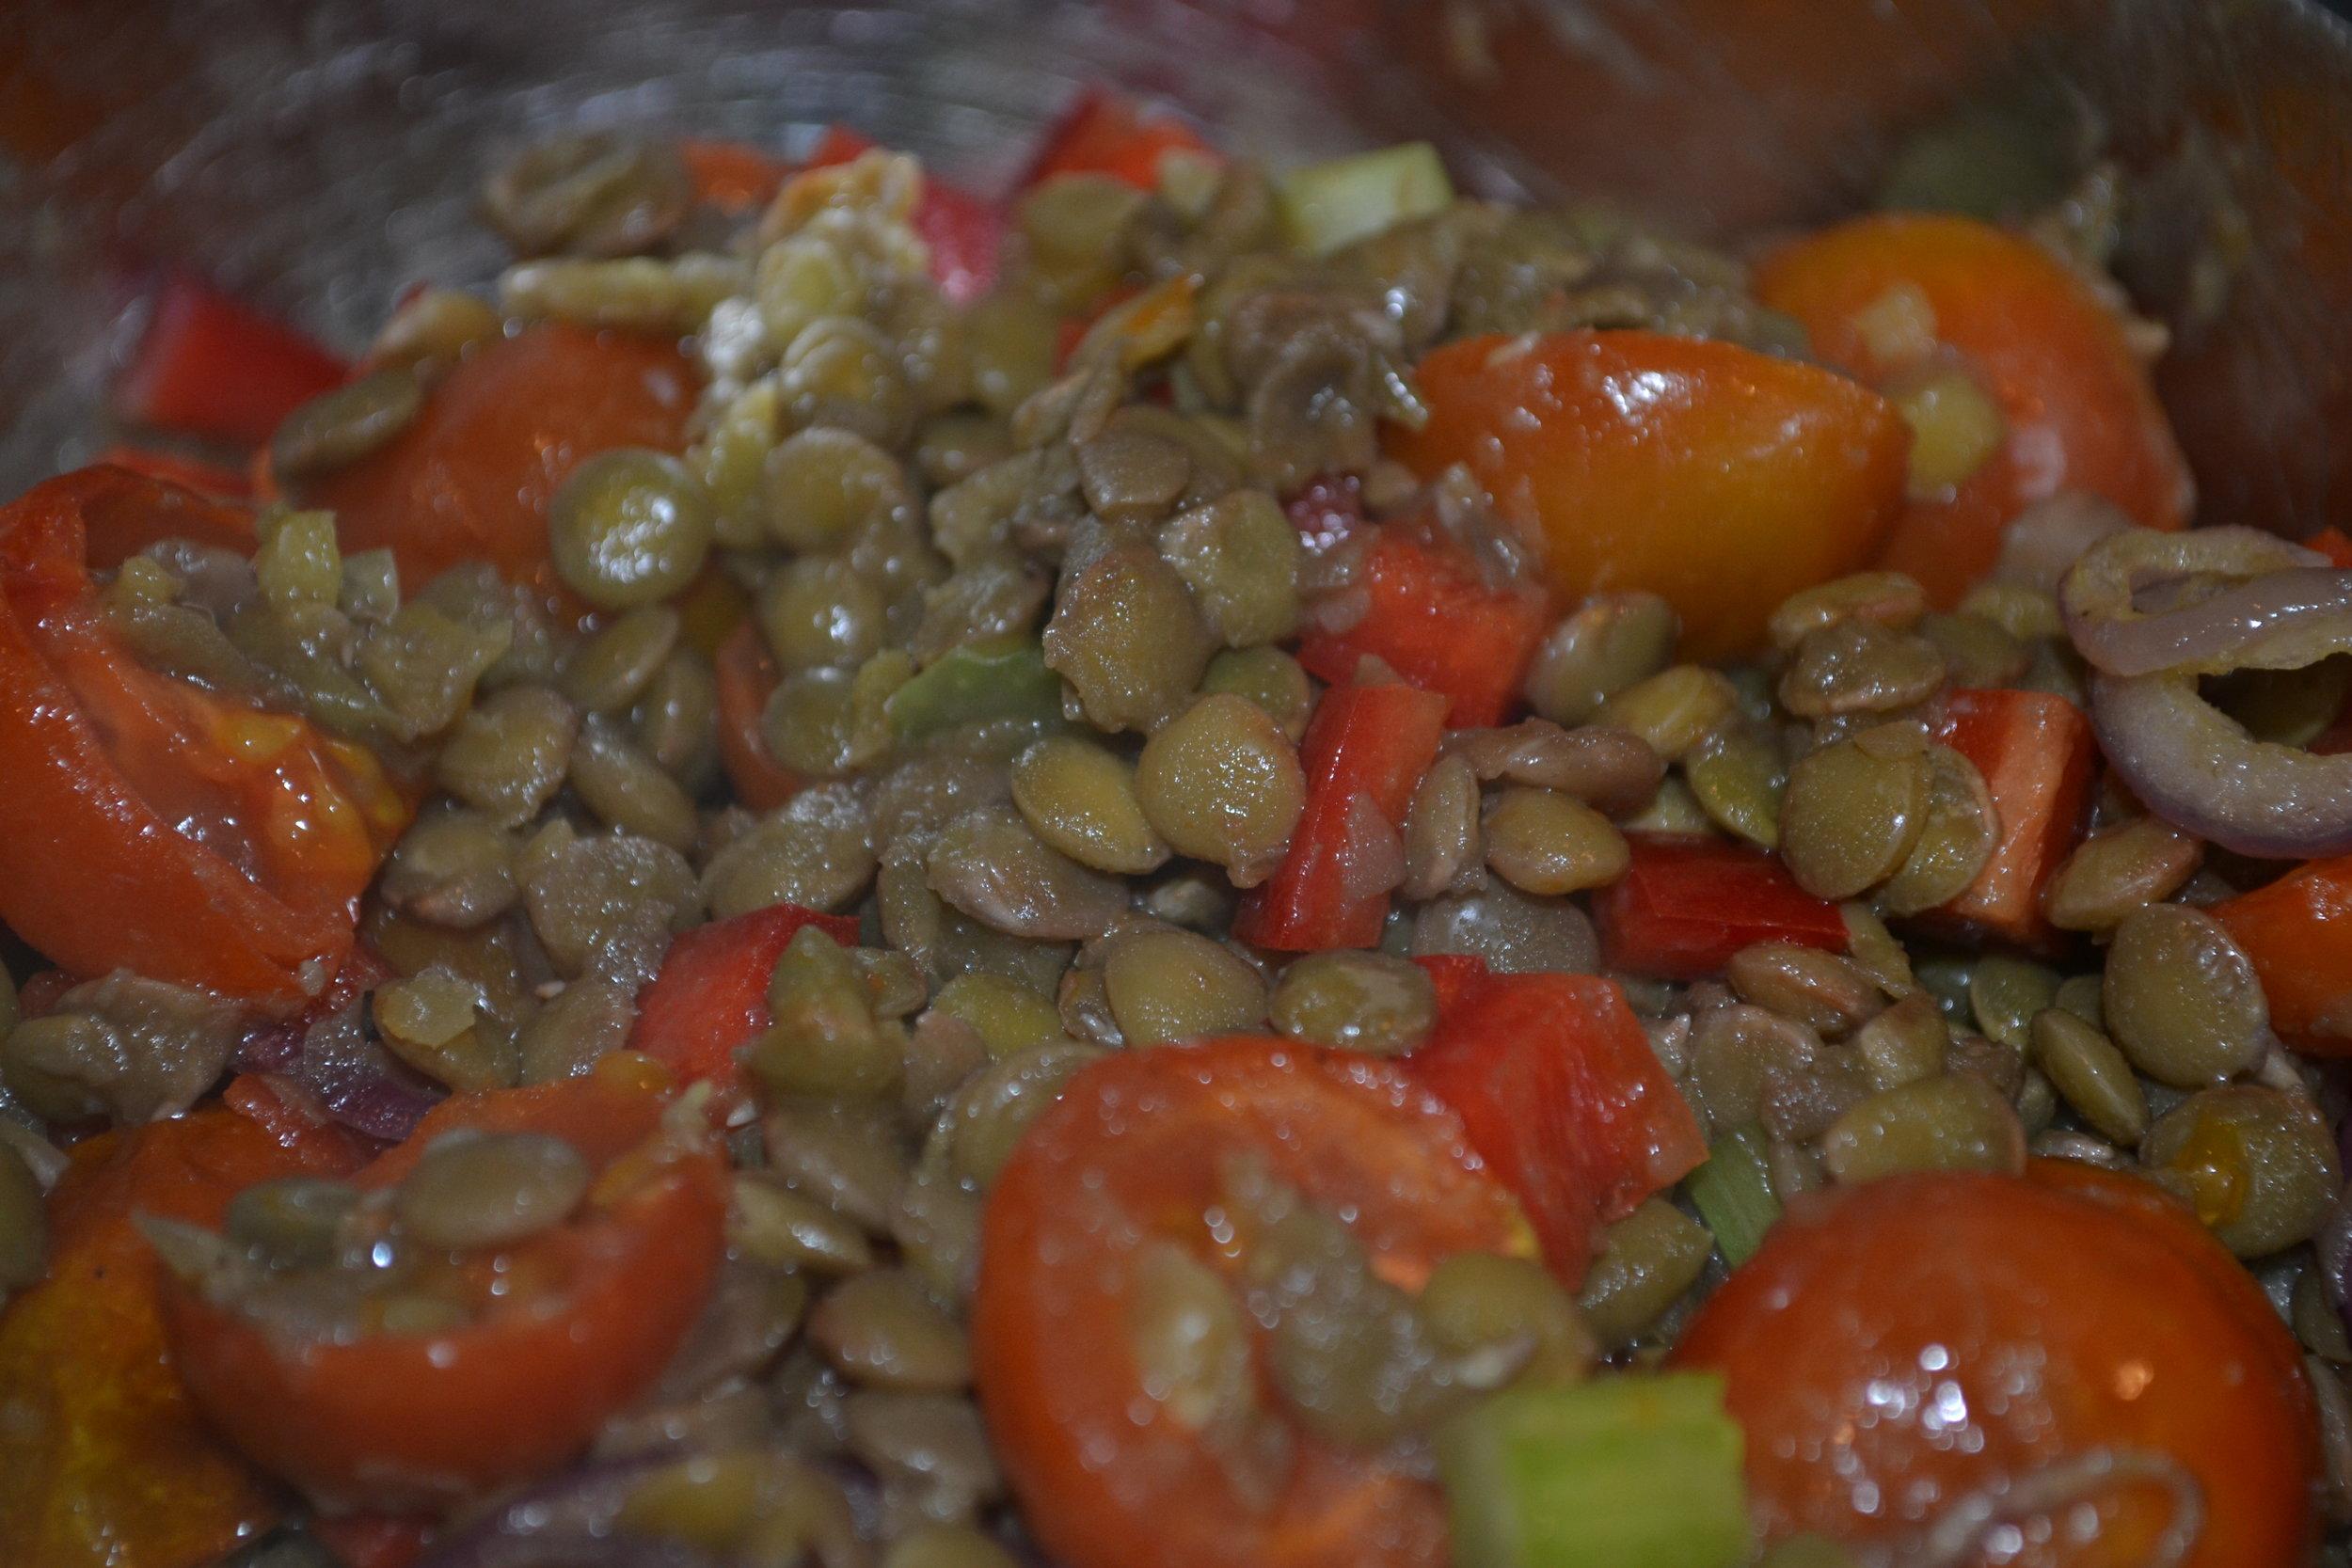 Green Lentil Salad Healthy Food for HideAway Haven Hostesses